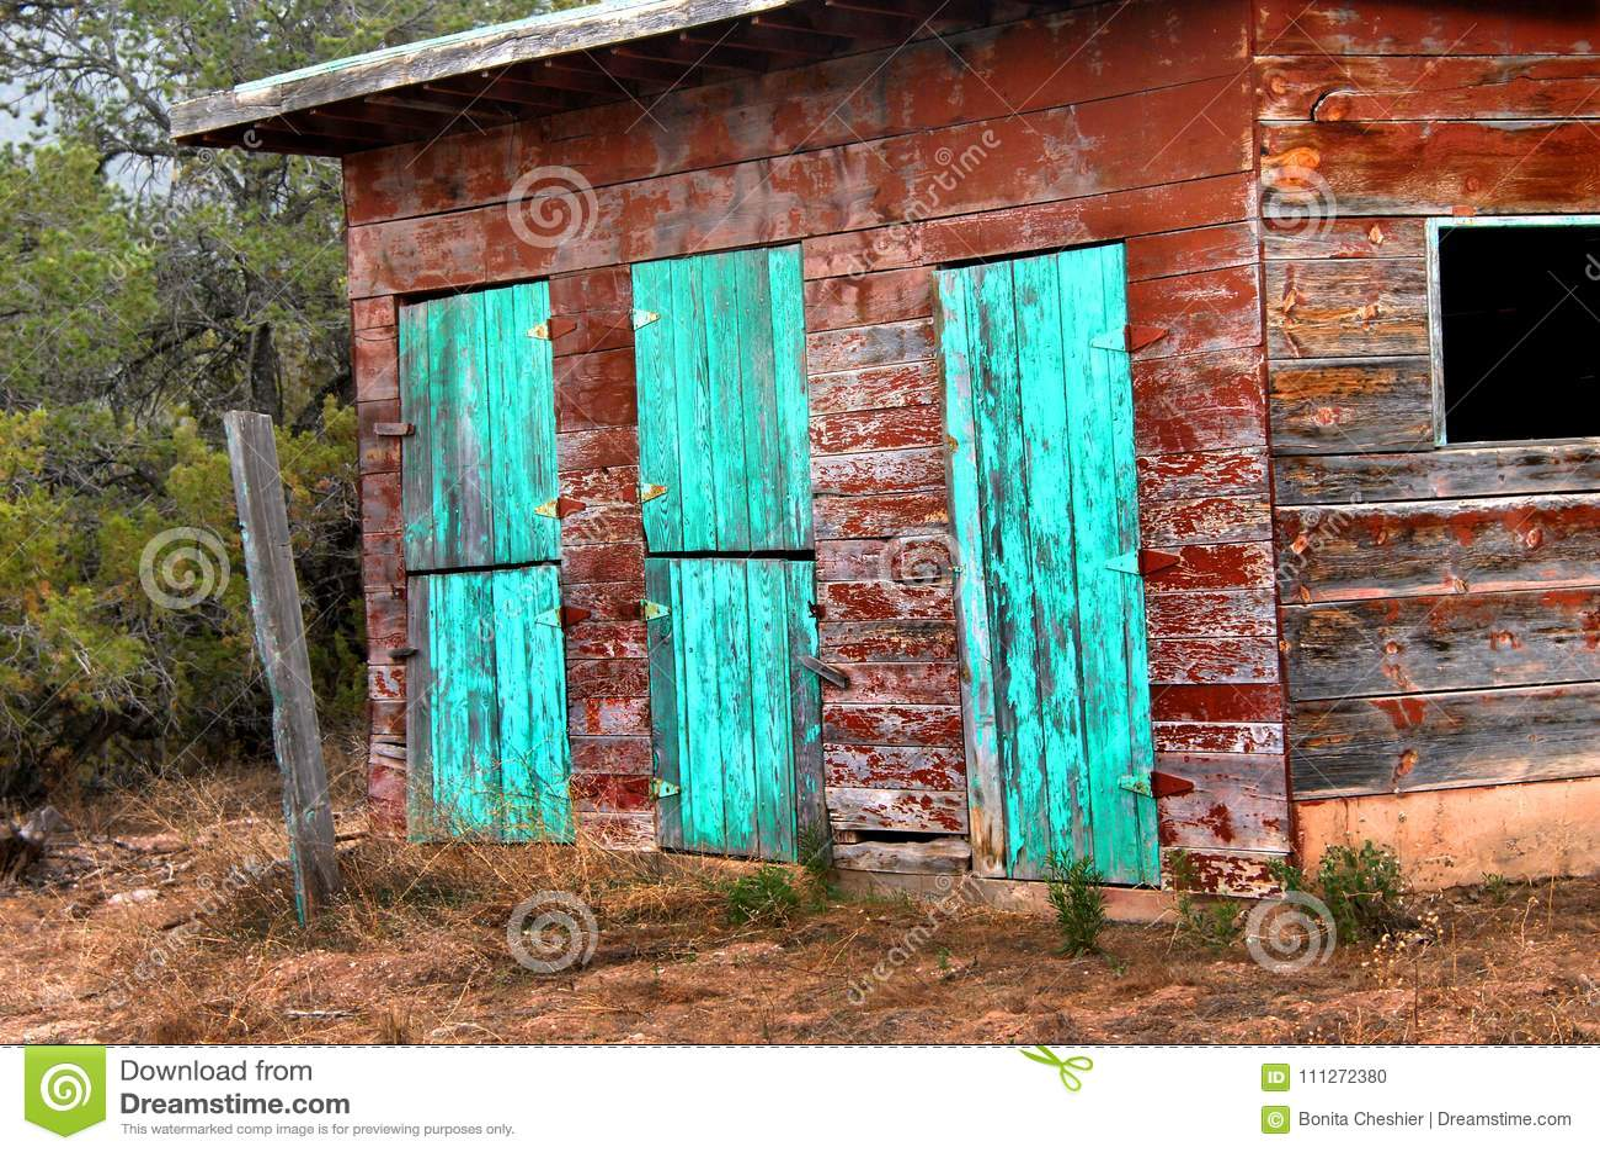 Barn With Turquoise Doorway Stock Photo Image Of Weathered Worn